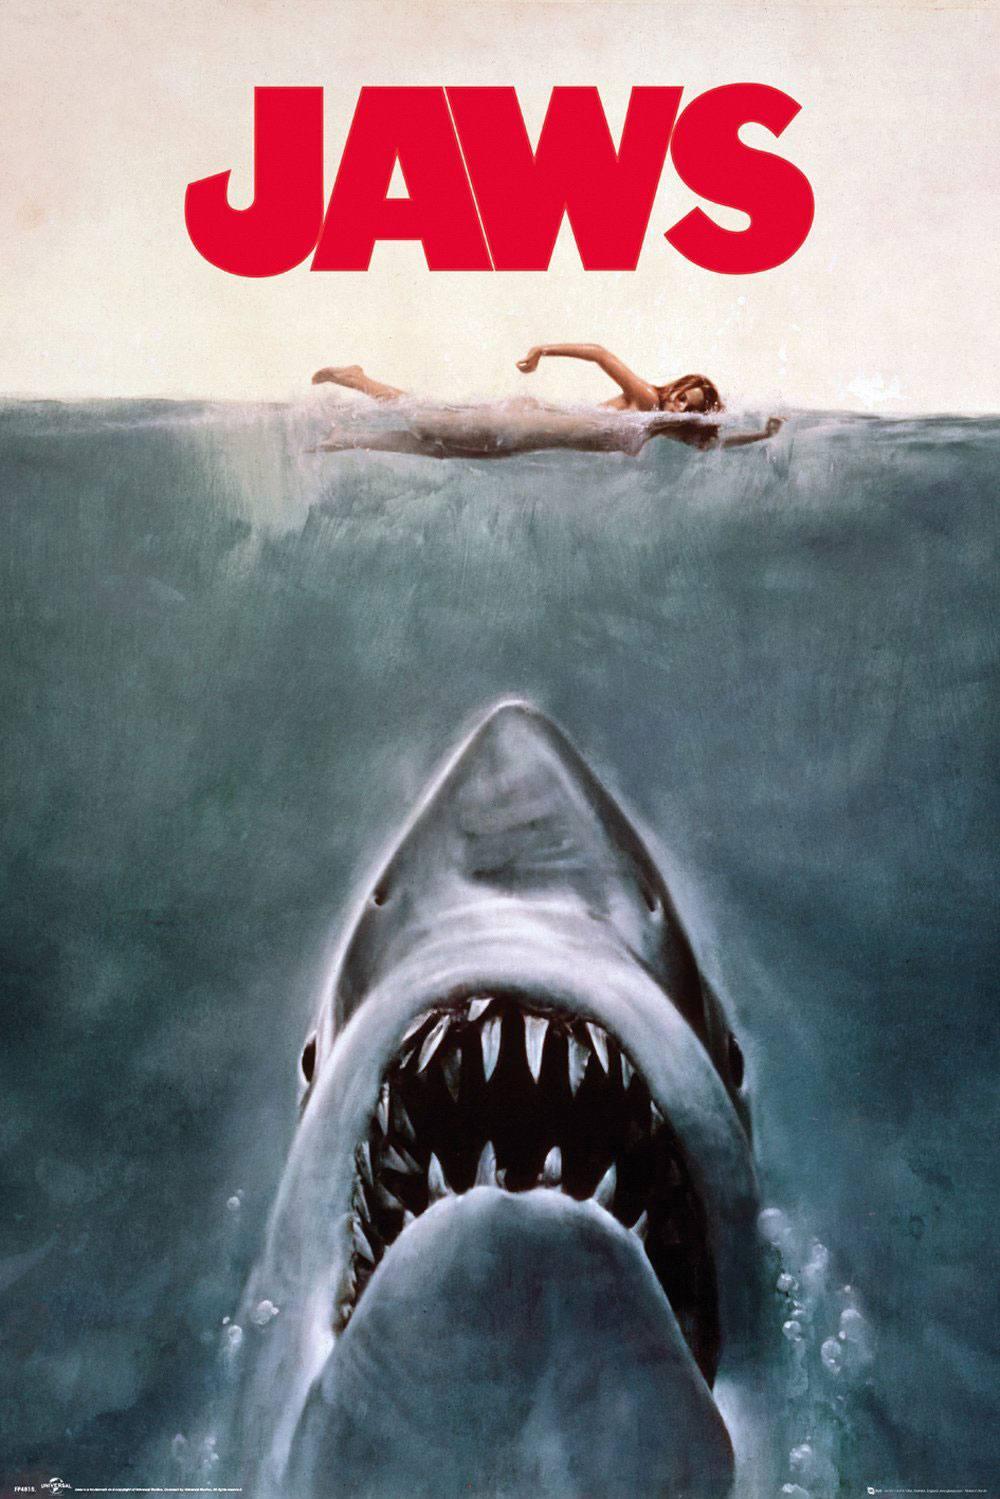 Jaws Poster Pack Key Art 61 x 91 cm (5)